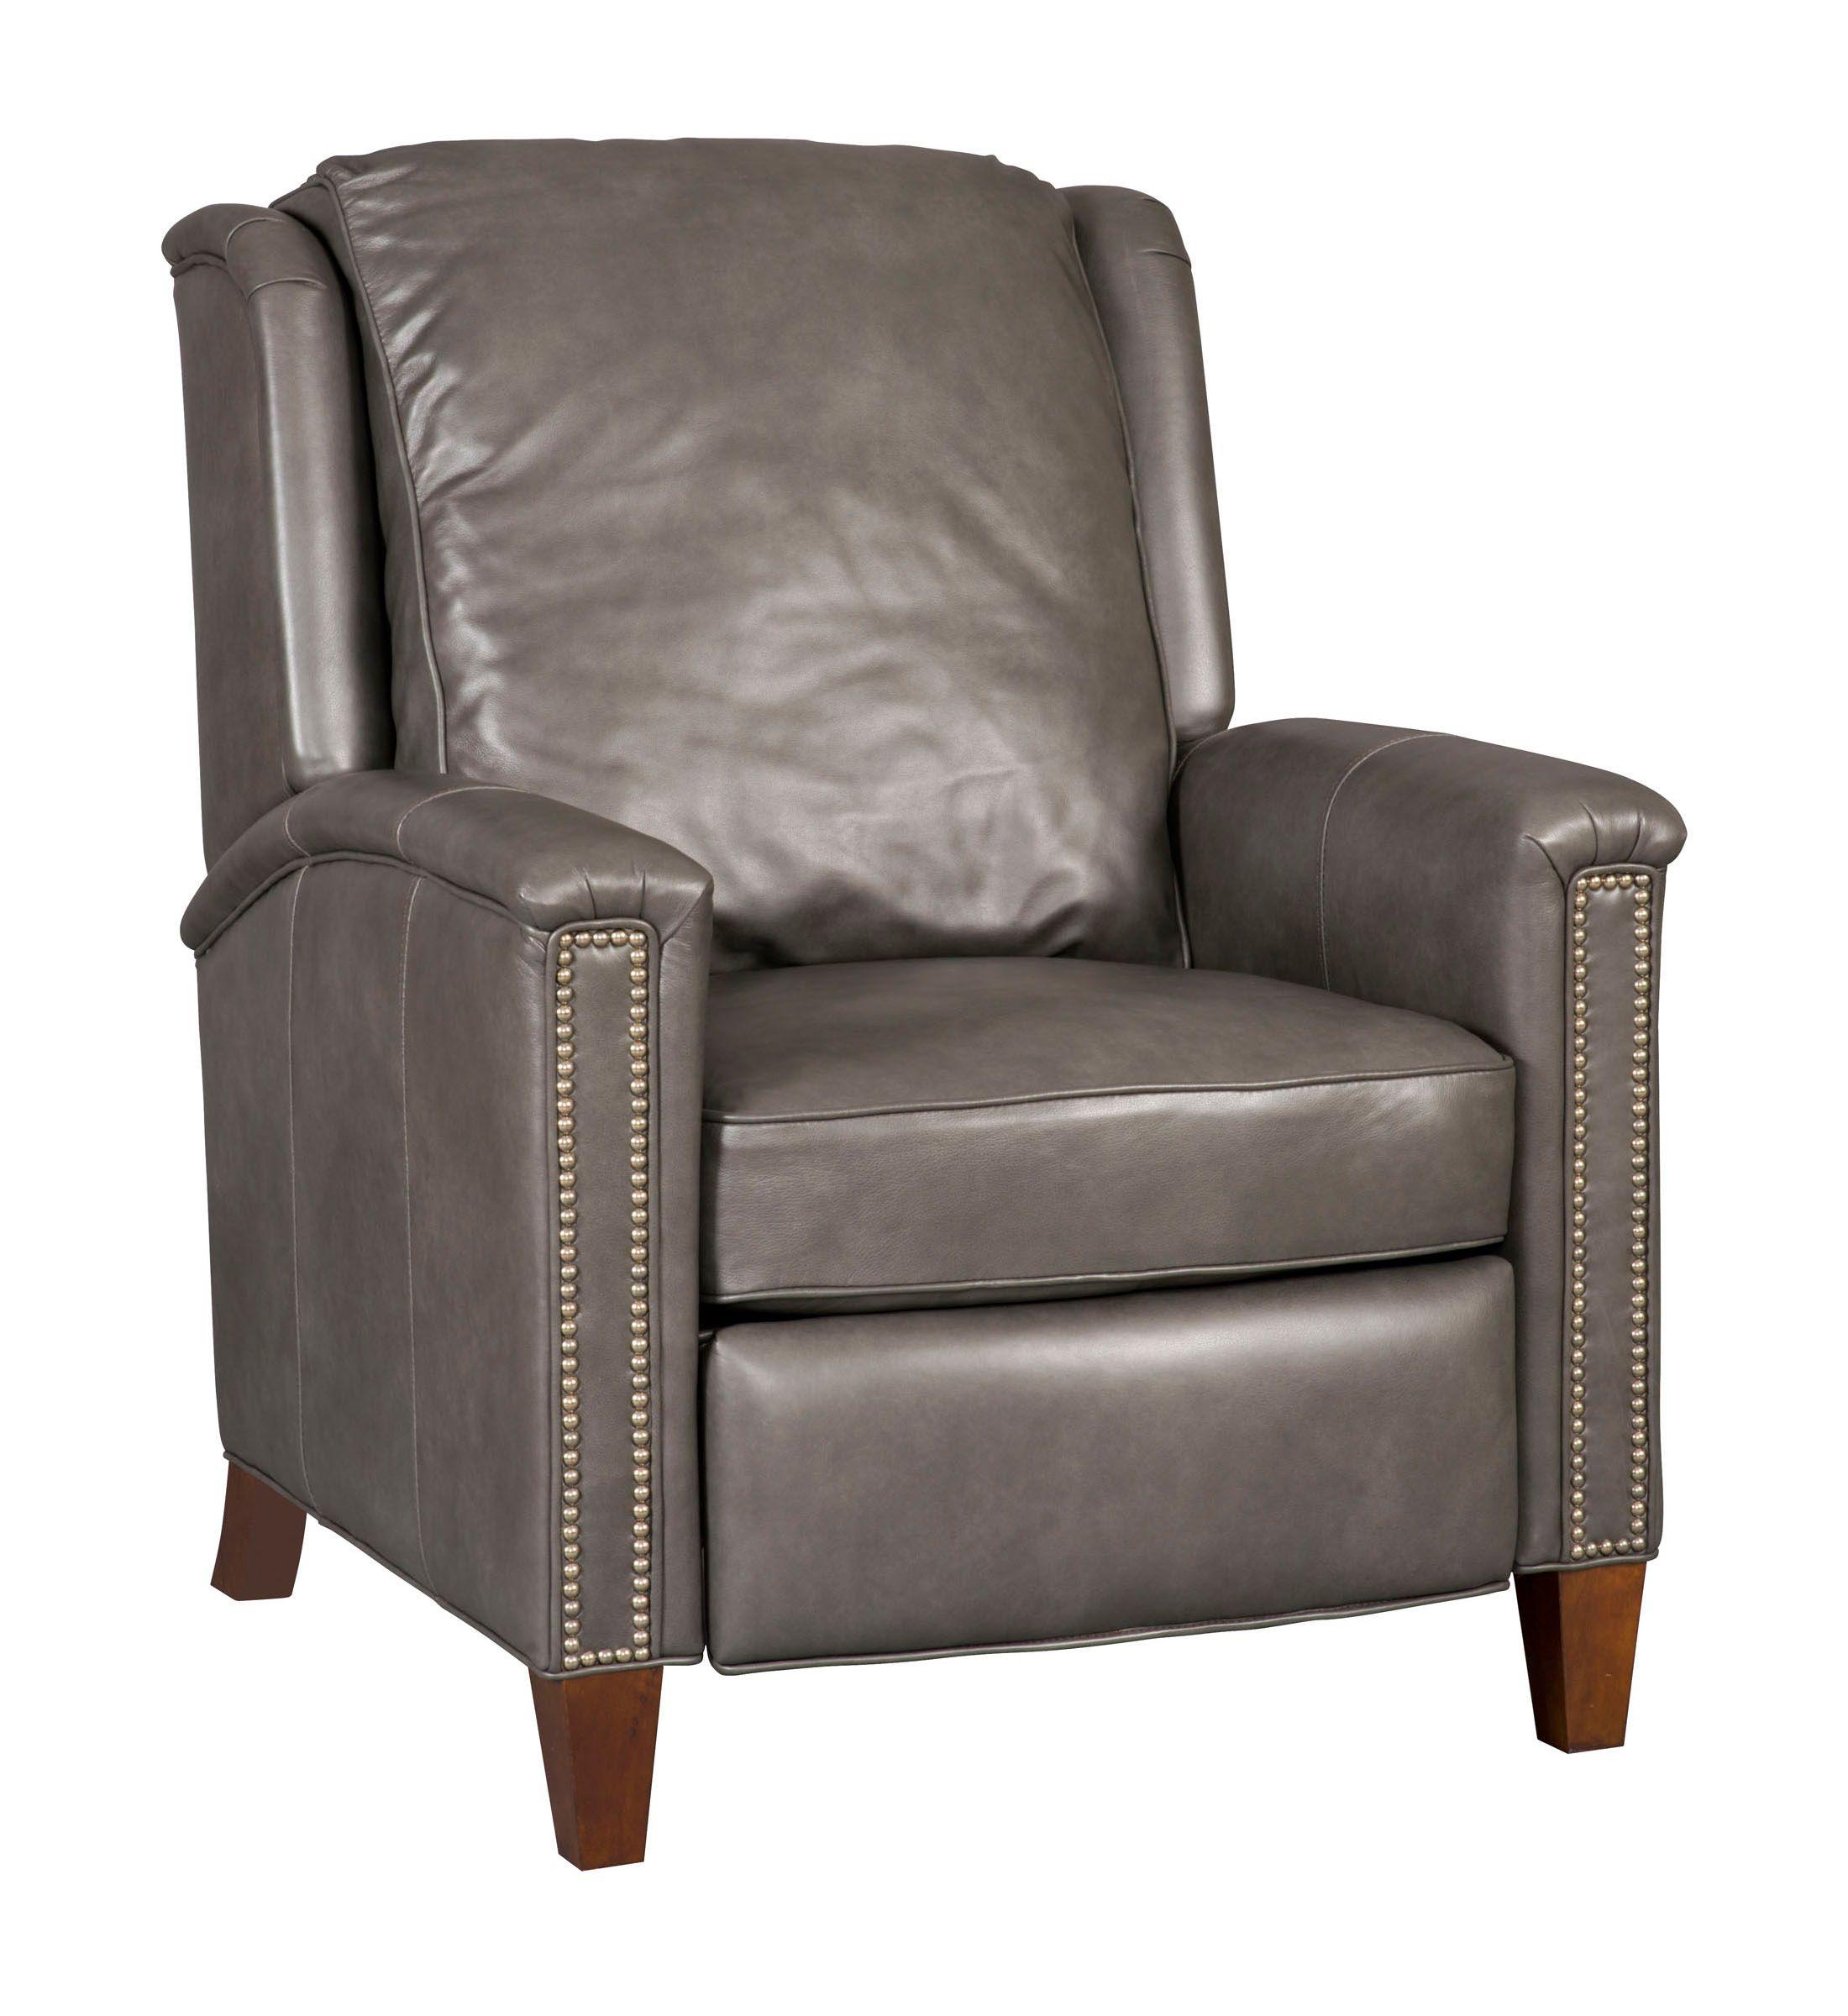 Hooker Furniture Recliner RC517-083